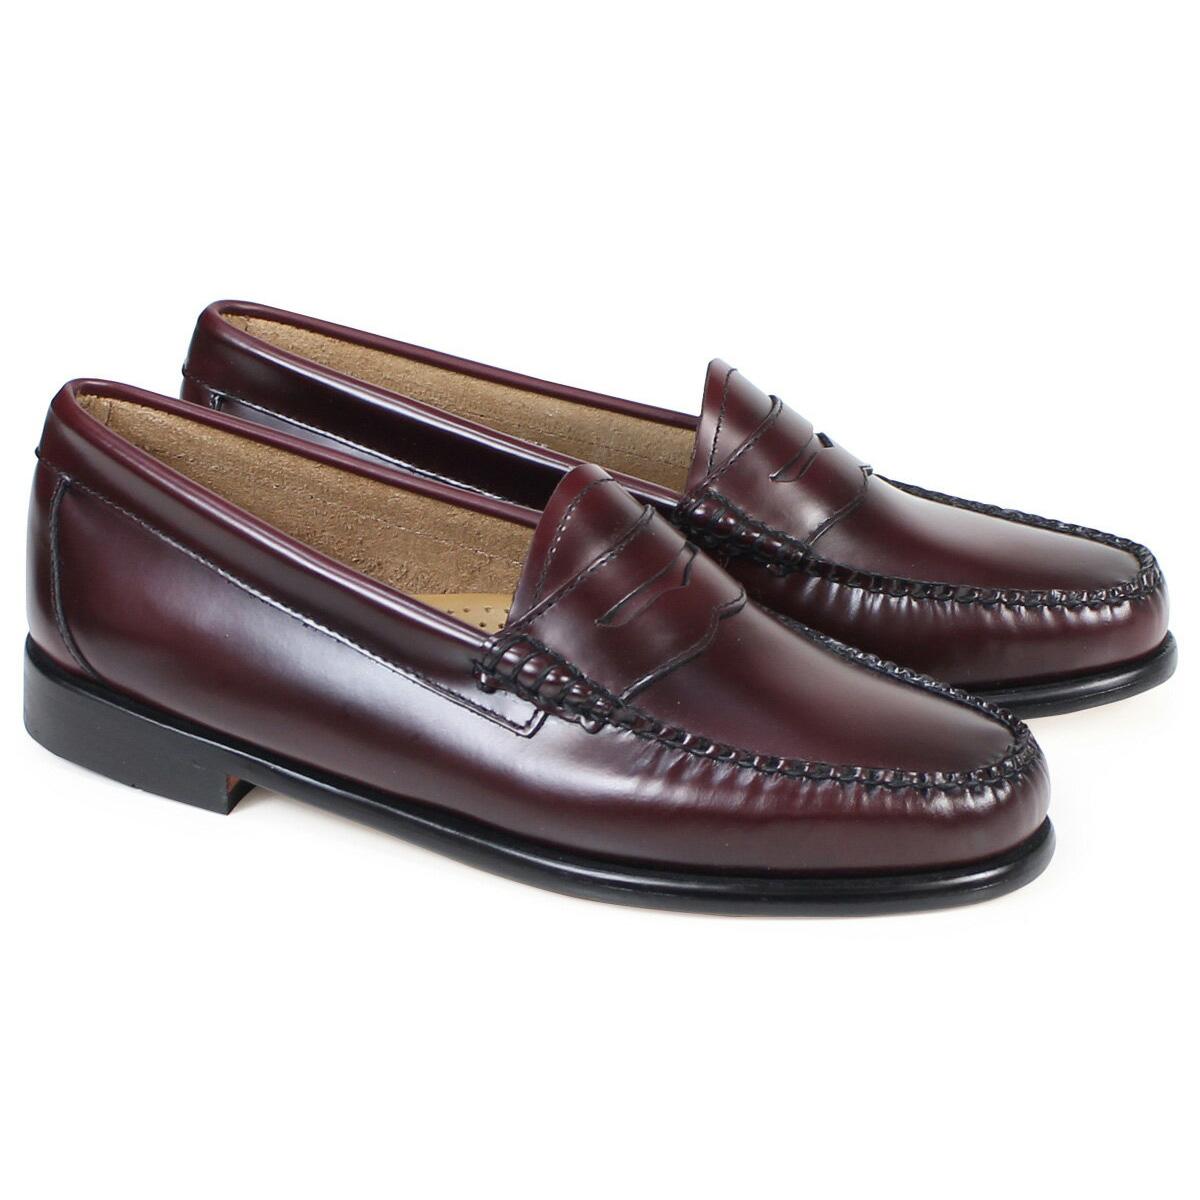 G.H. BASS WHITNEY LOAFER ローファー ジーエイチバス レディース 71-10339 靴 バーガンディー